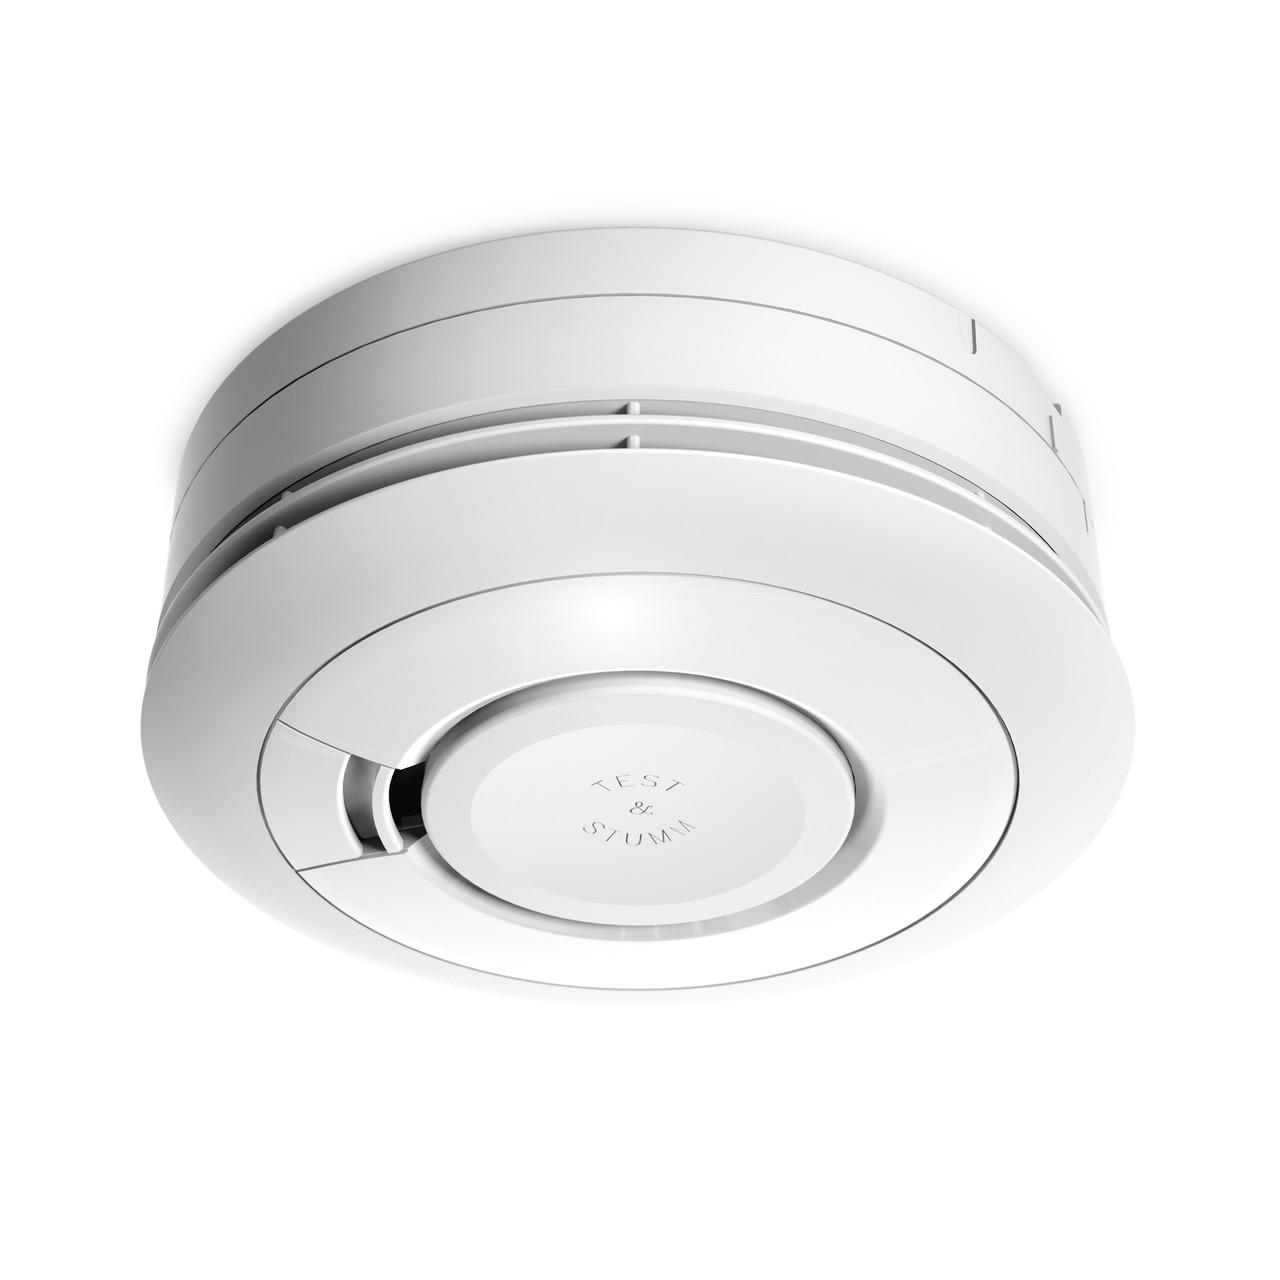 Ei Electronics Rauchmelder Ei650i -AudioLINK- i-serie